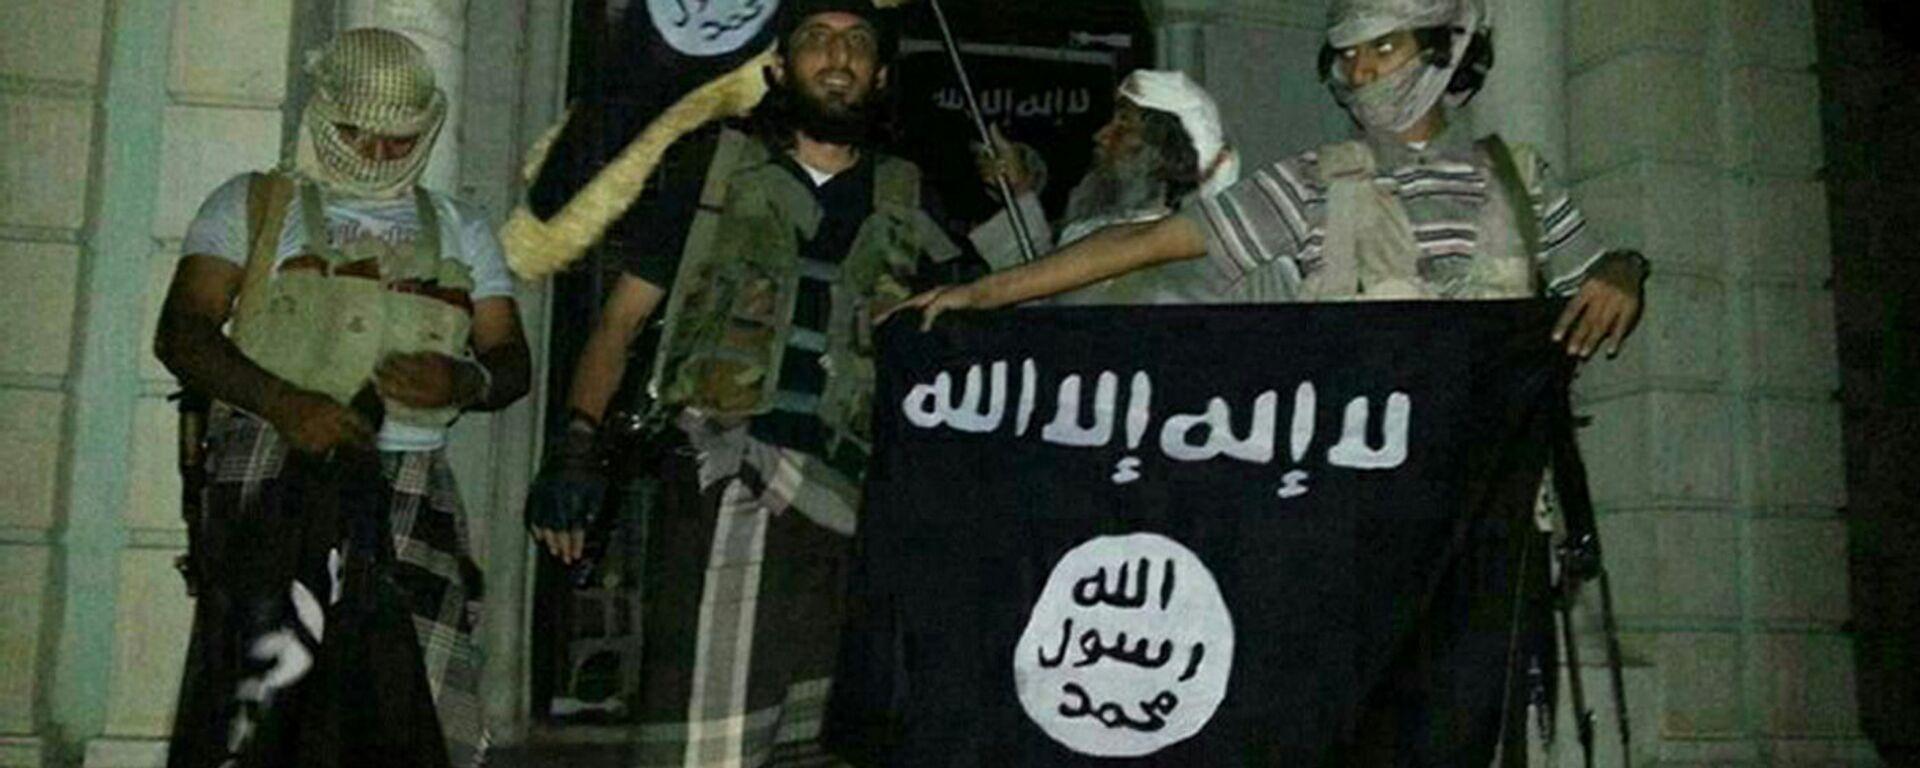 Terroristi dell'al Qaeda - Sputnik Italia, 1920, 14.09.2021